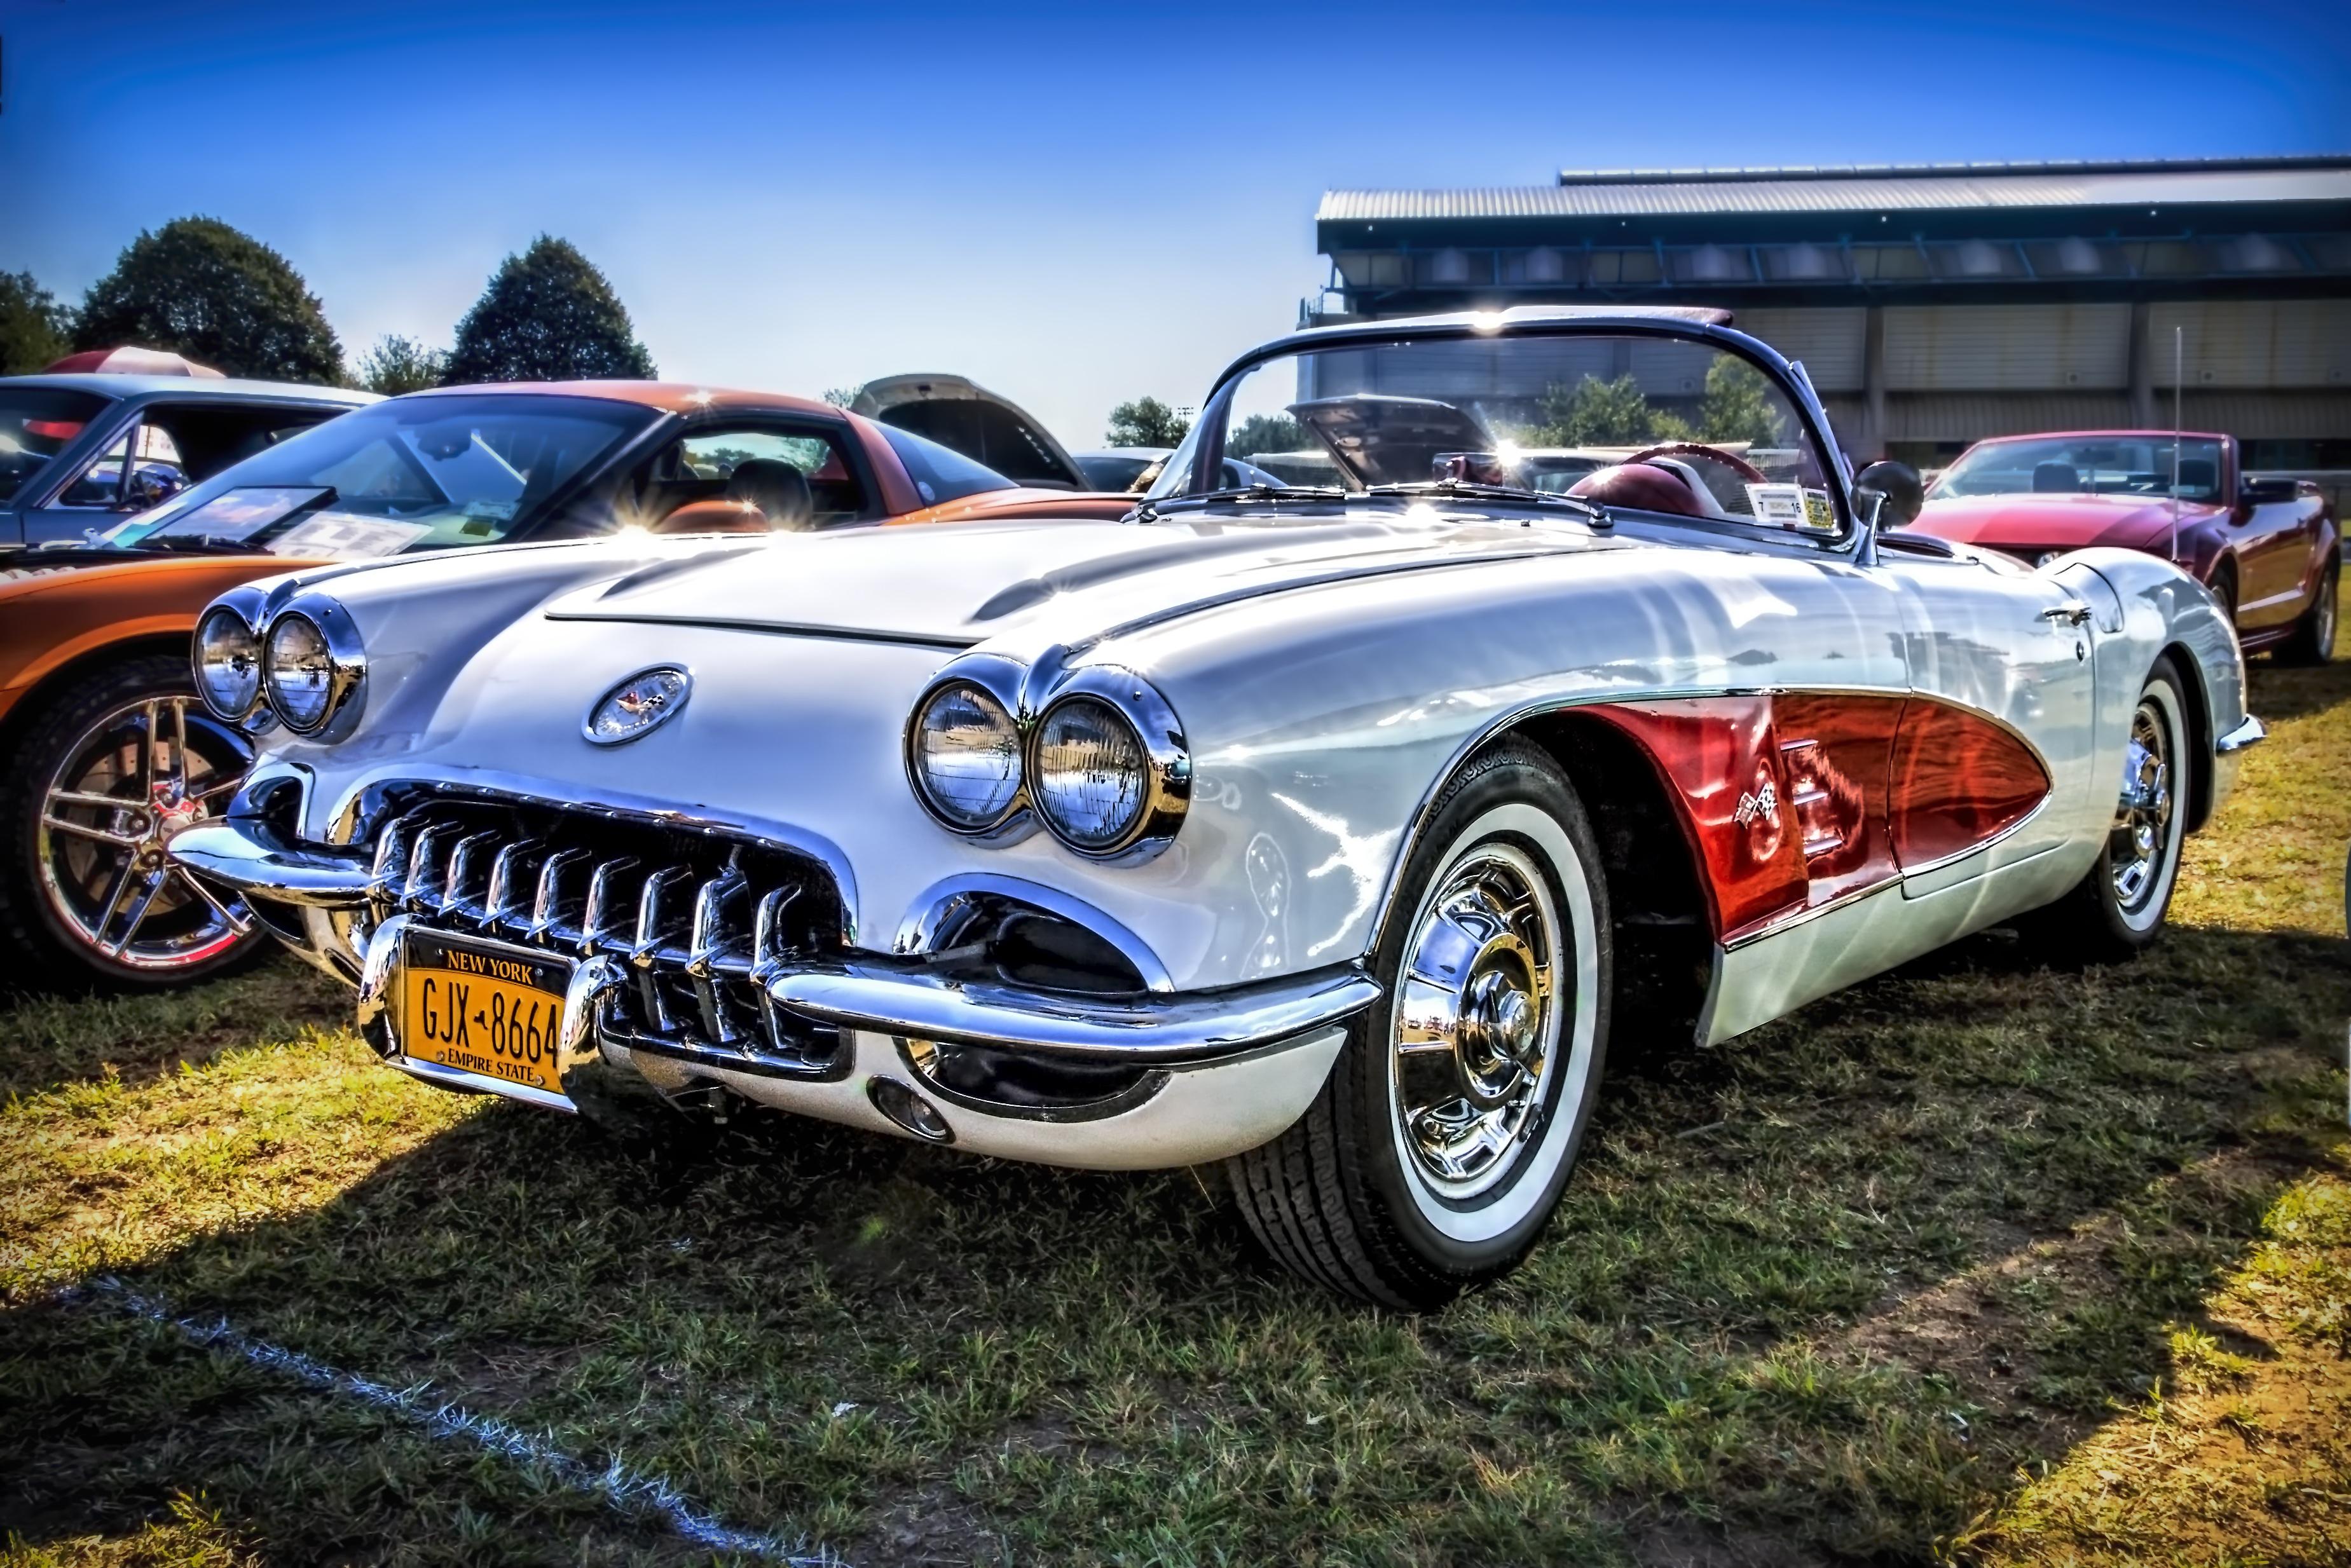 Free Images Retro Old Transportation Auto Nostalgia Historic - Vintage car show